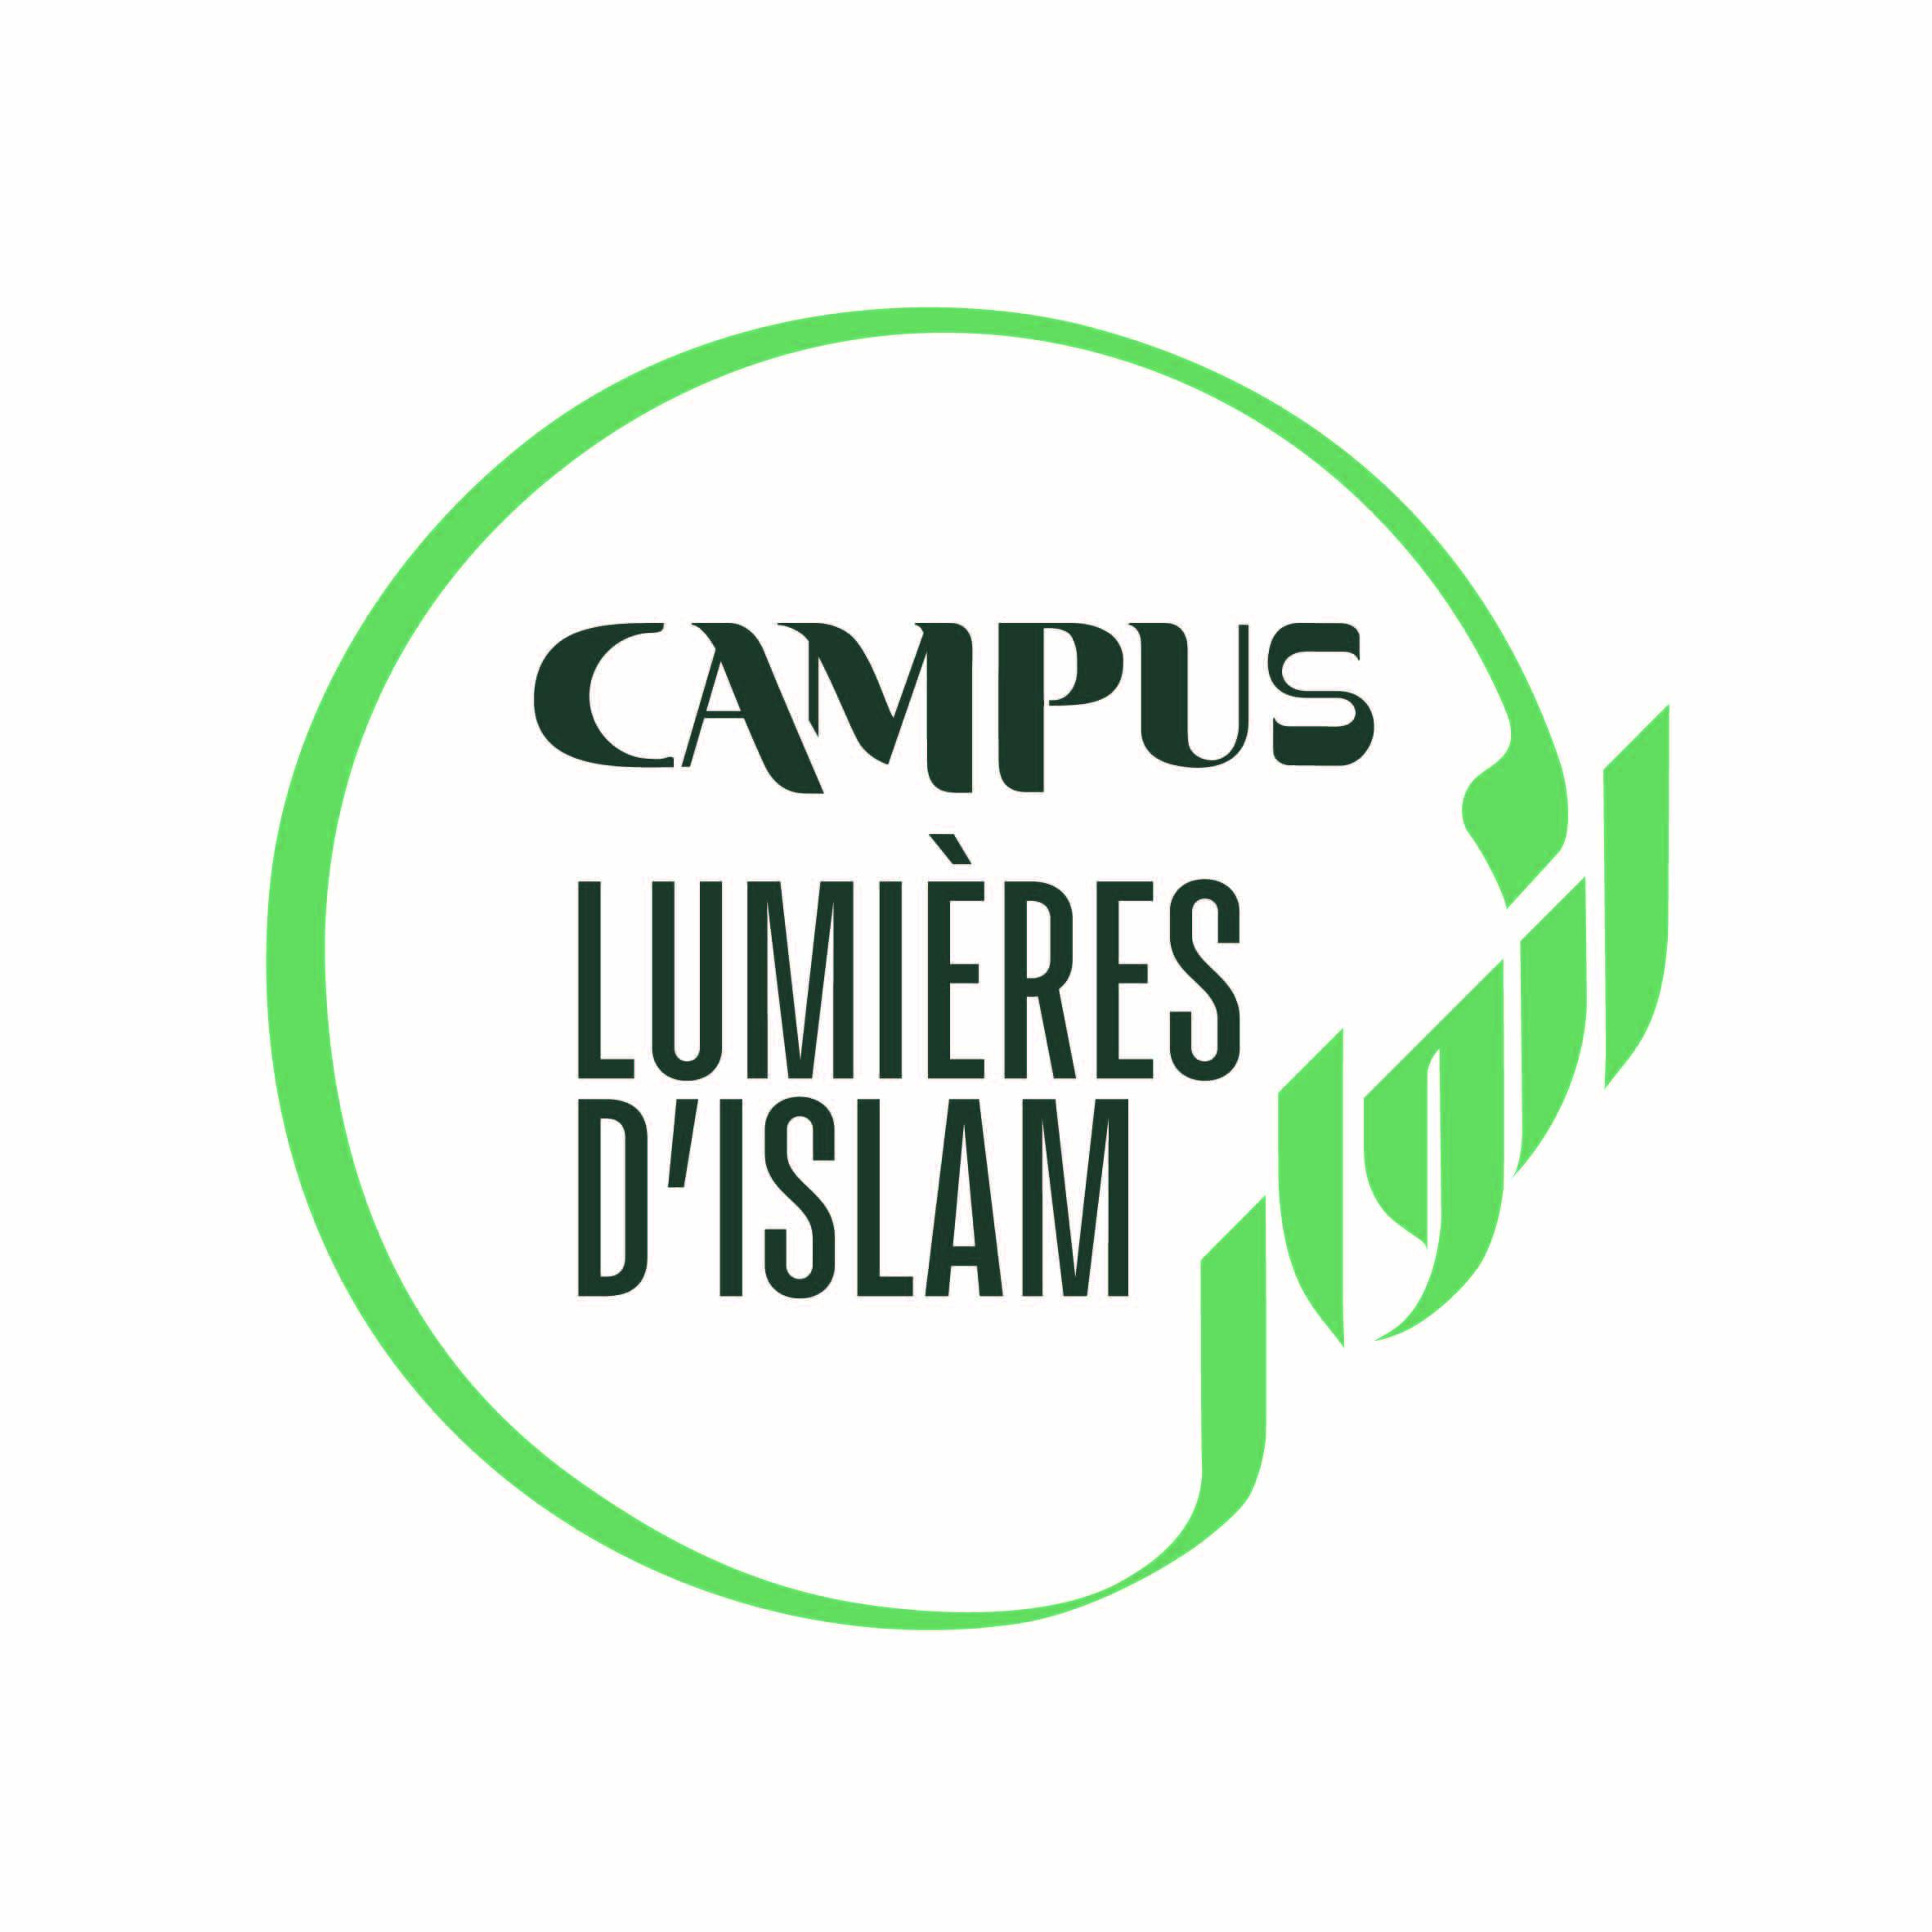 LOGO CAMPUS LUMIERES D'ISLAM